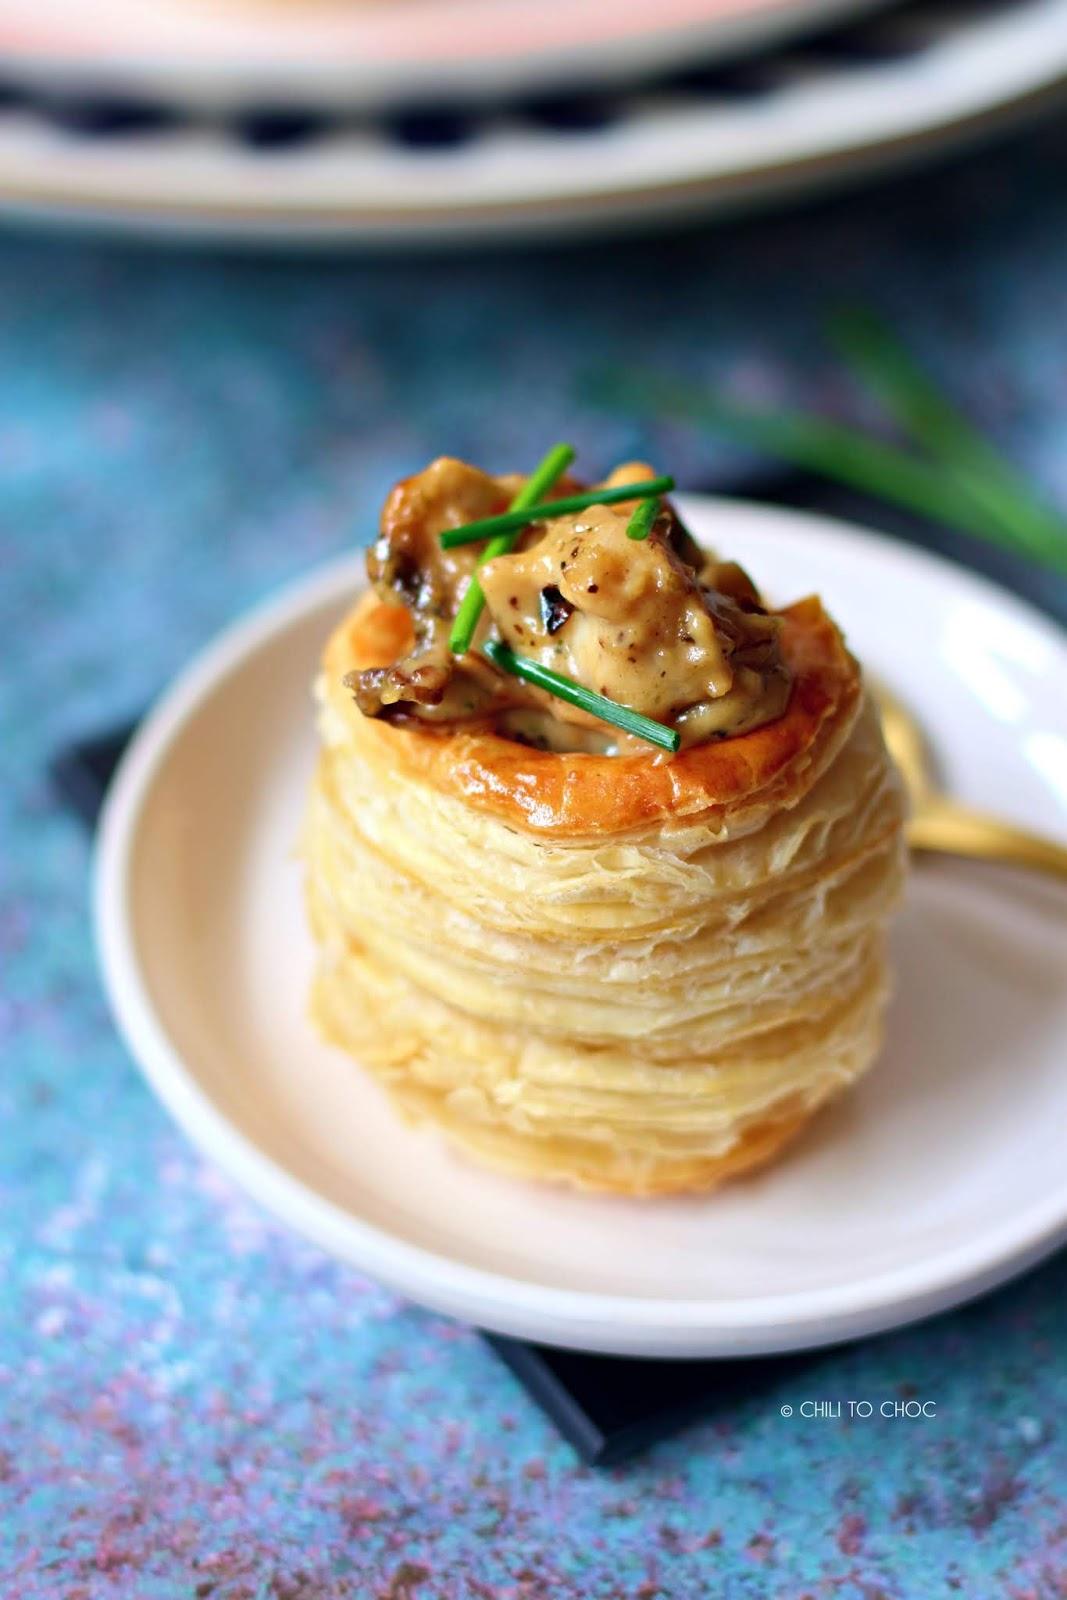 Chicken & Mushroom Vol Au Vent